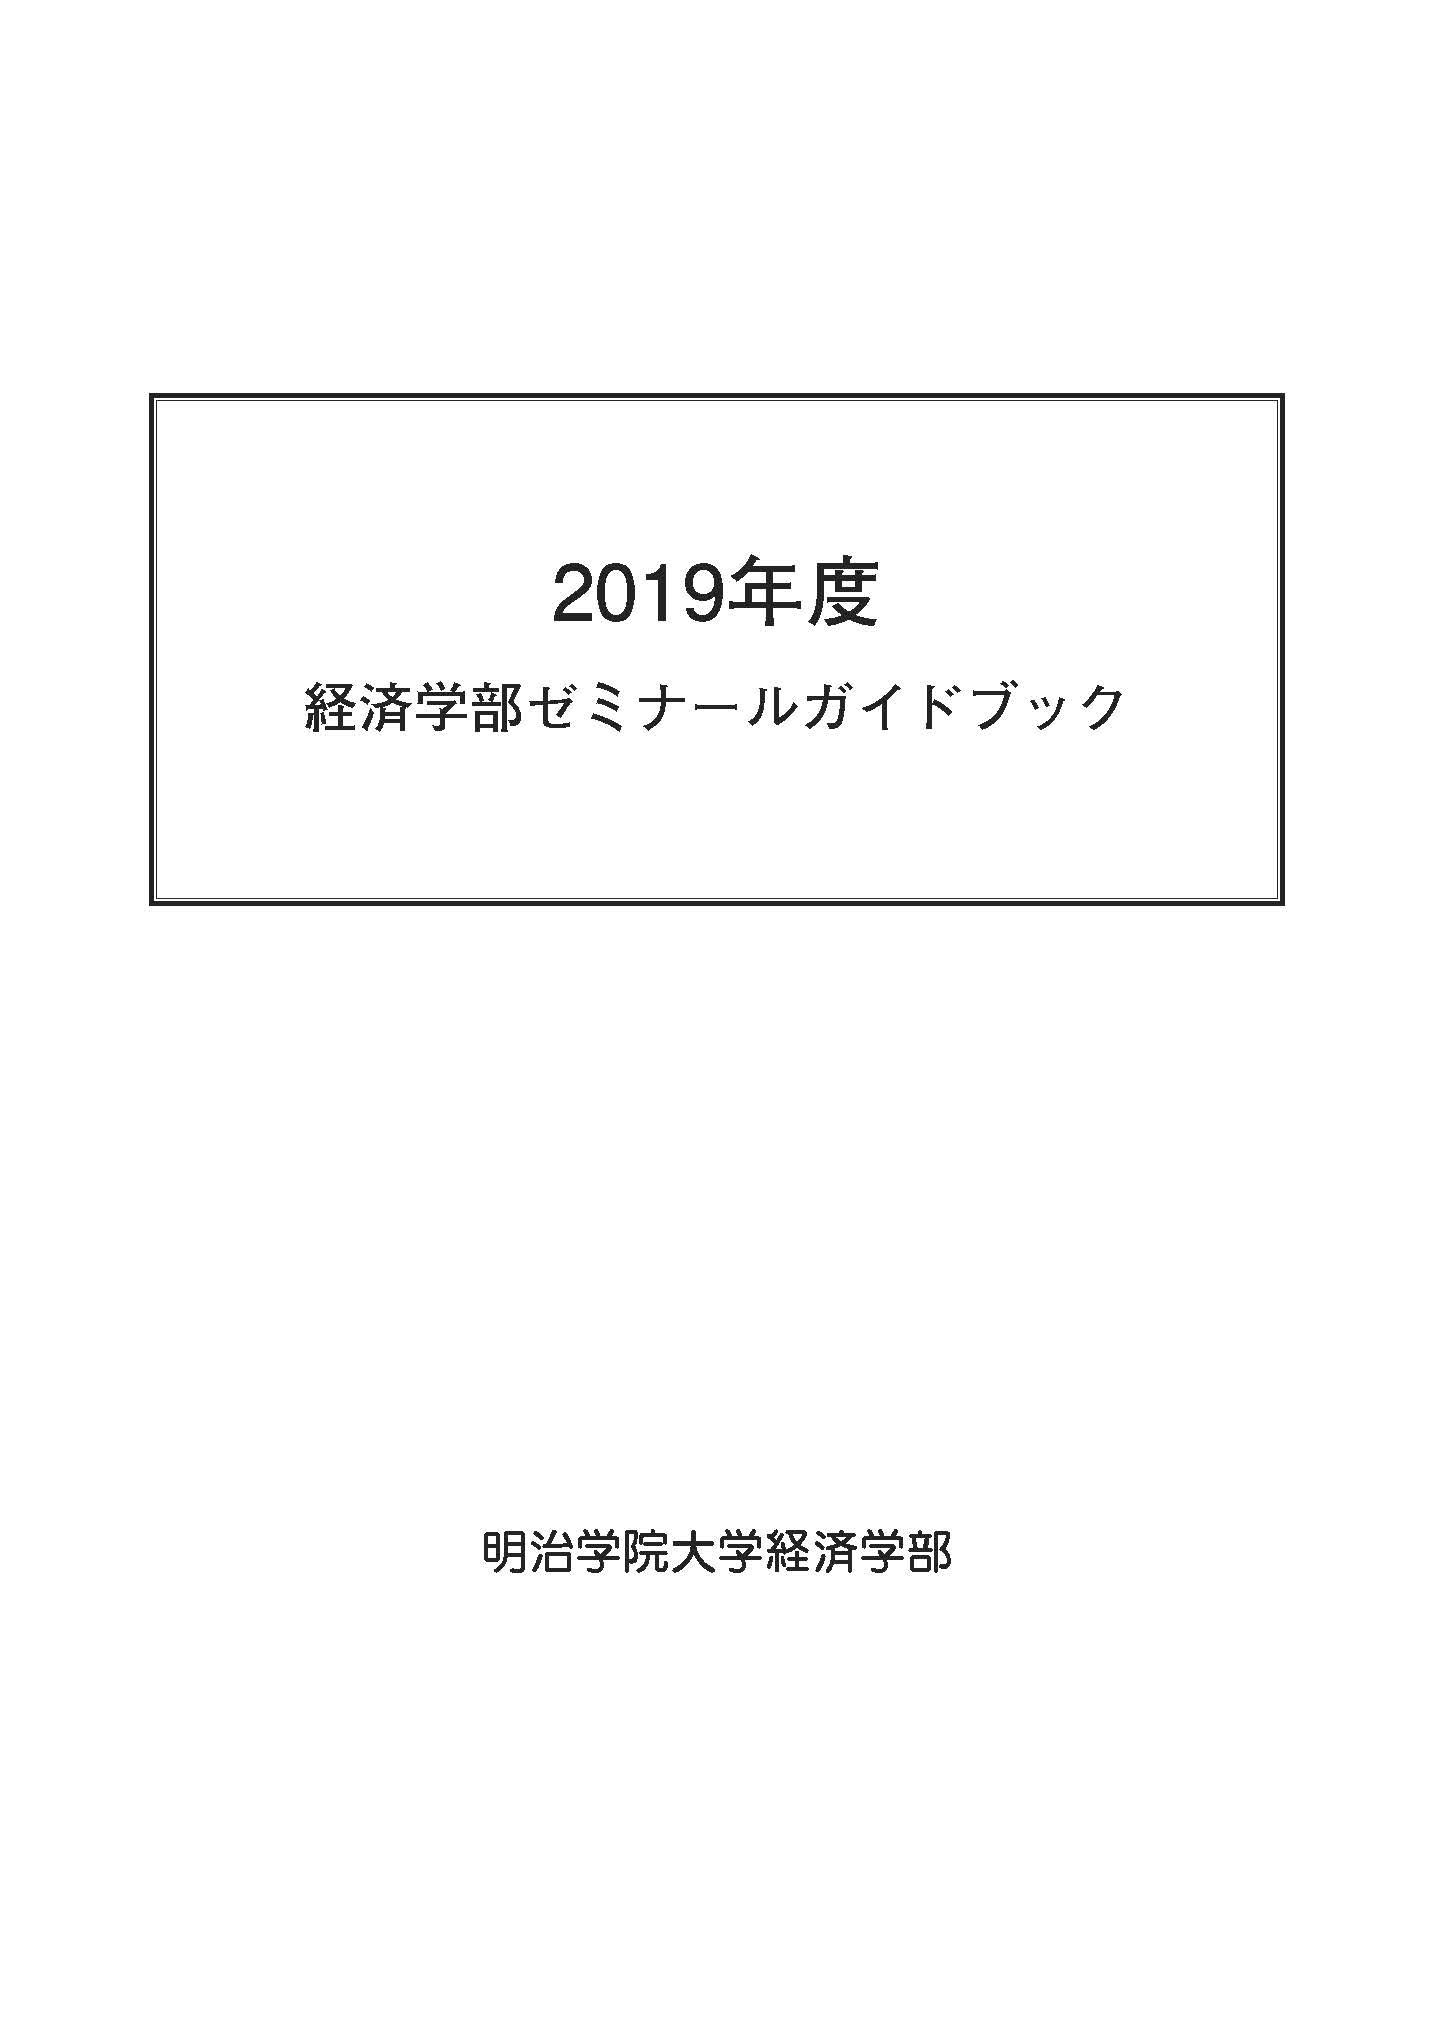 /image/2019seminar.fall.frontcover.jpg